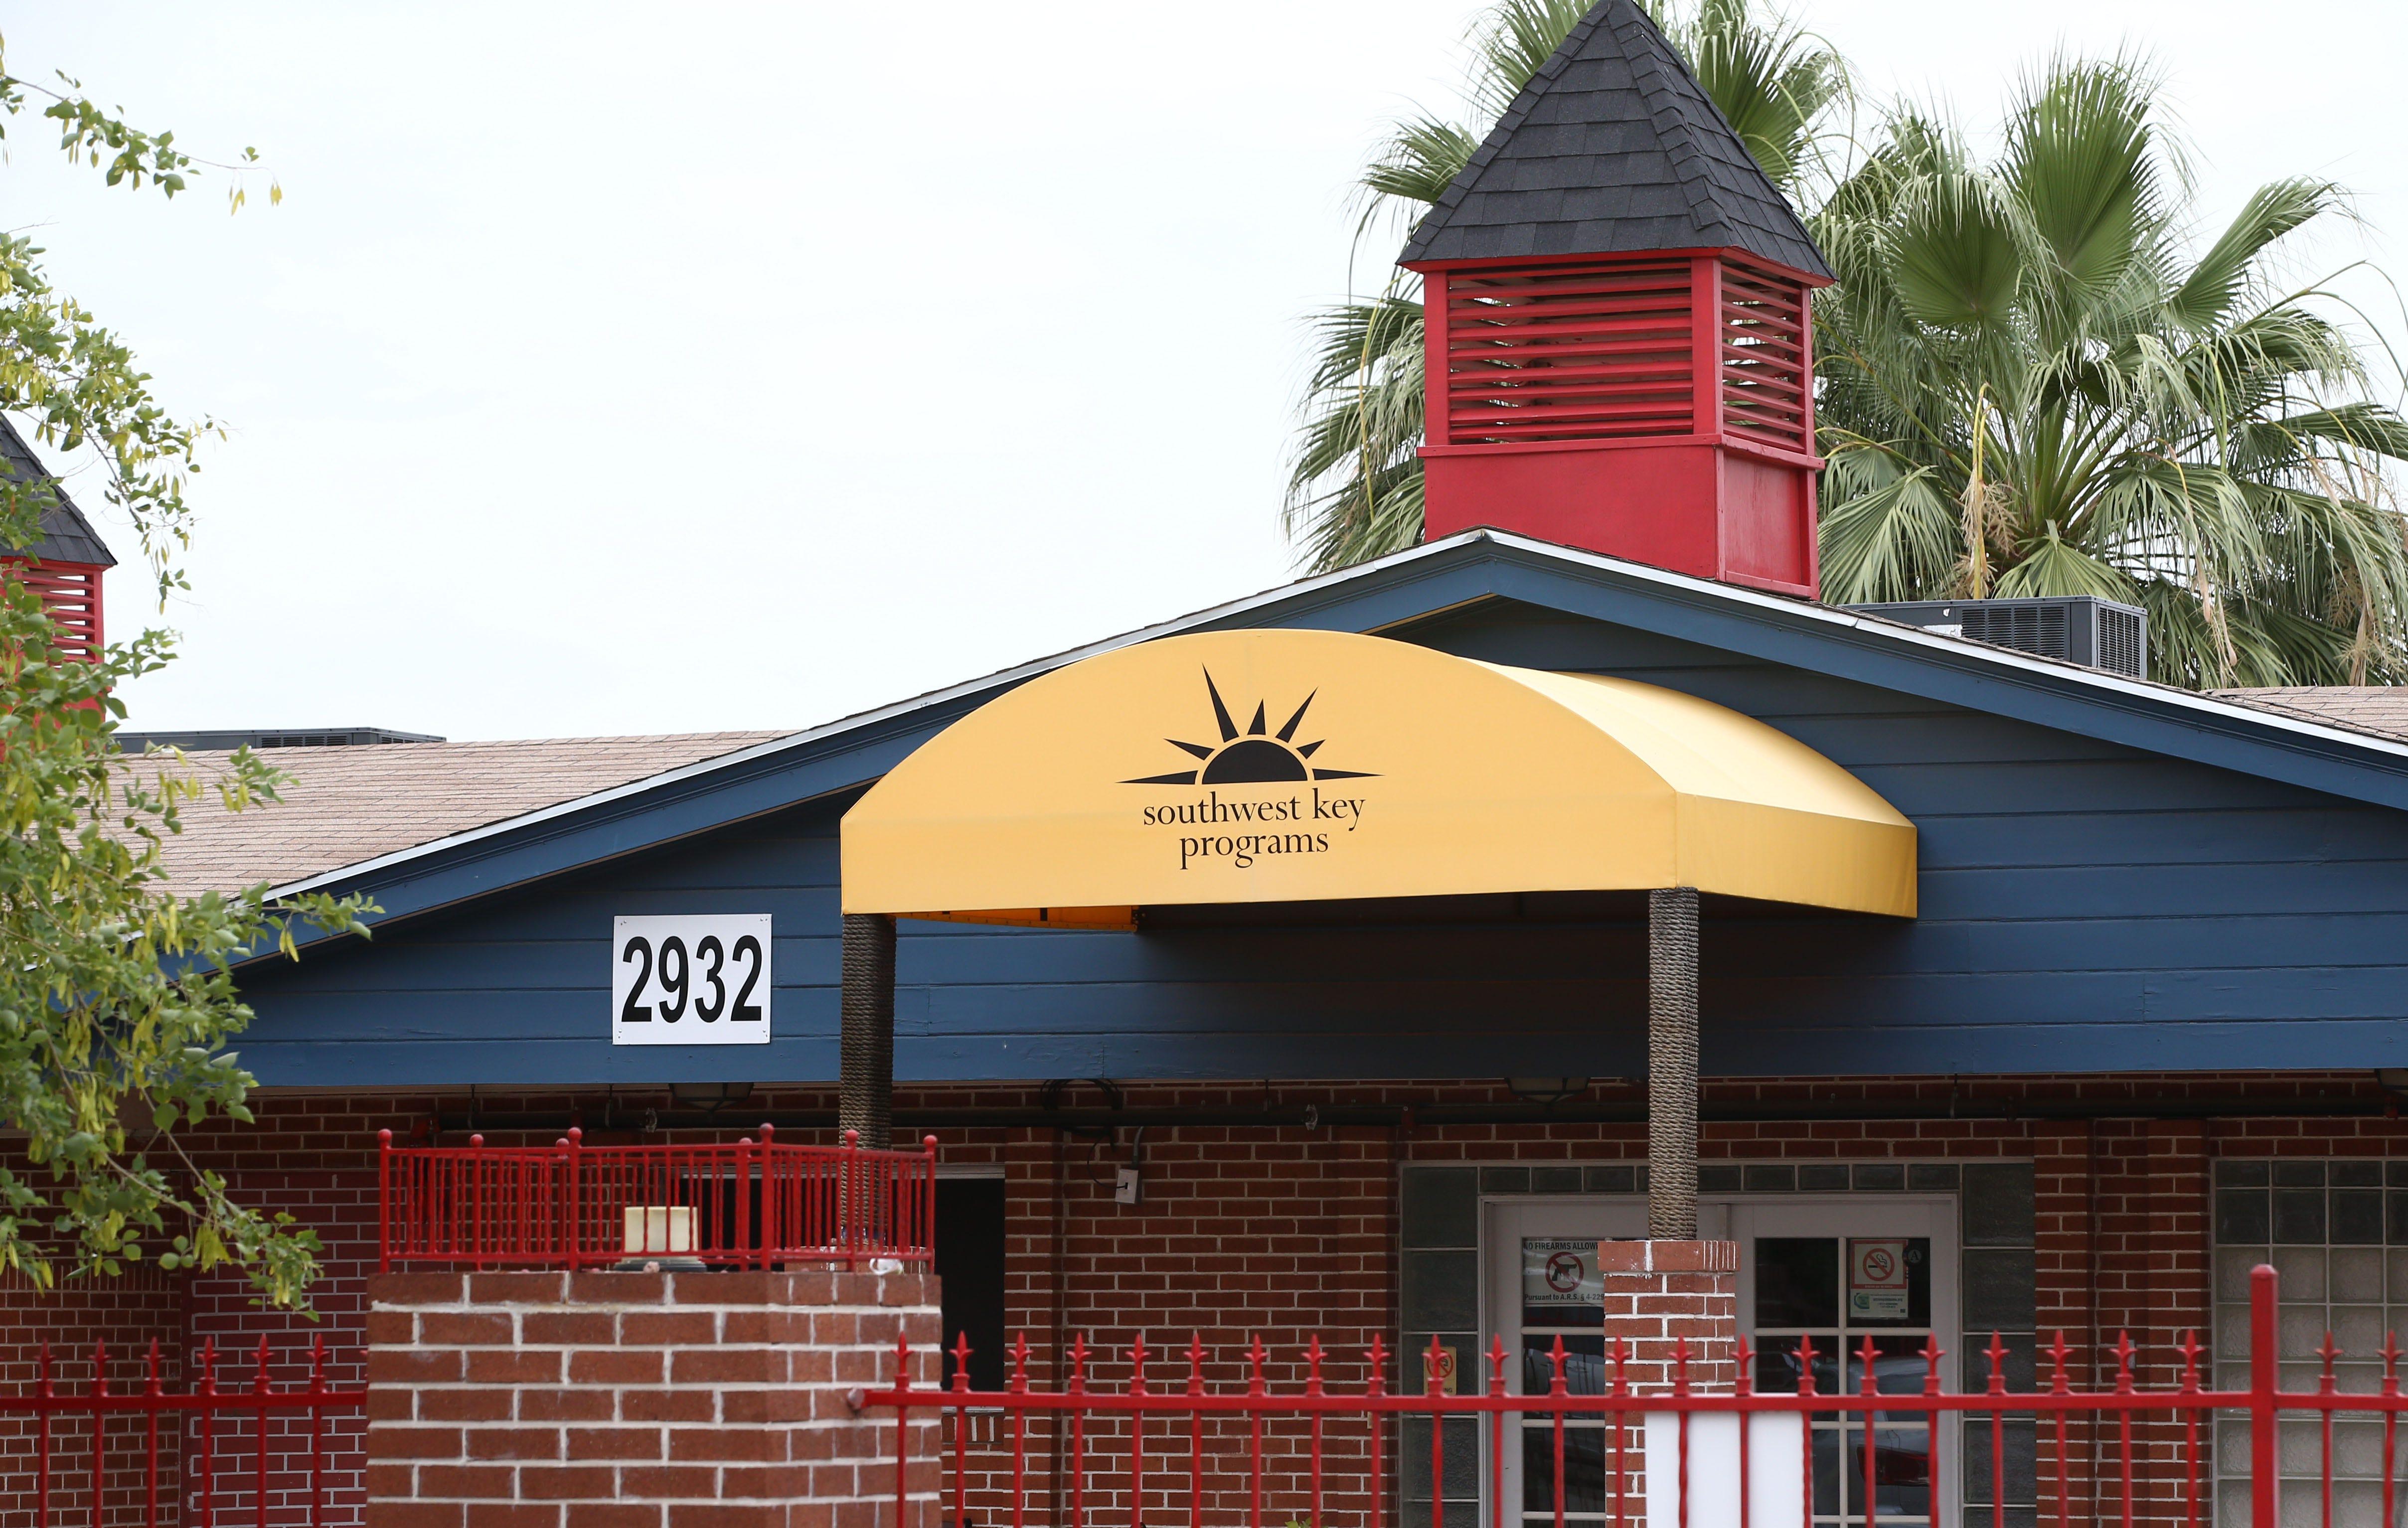 Videos: Migrant kids dragged, pushed at Southwest Key refuge